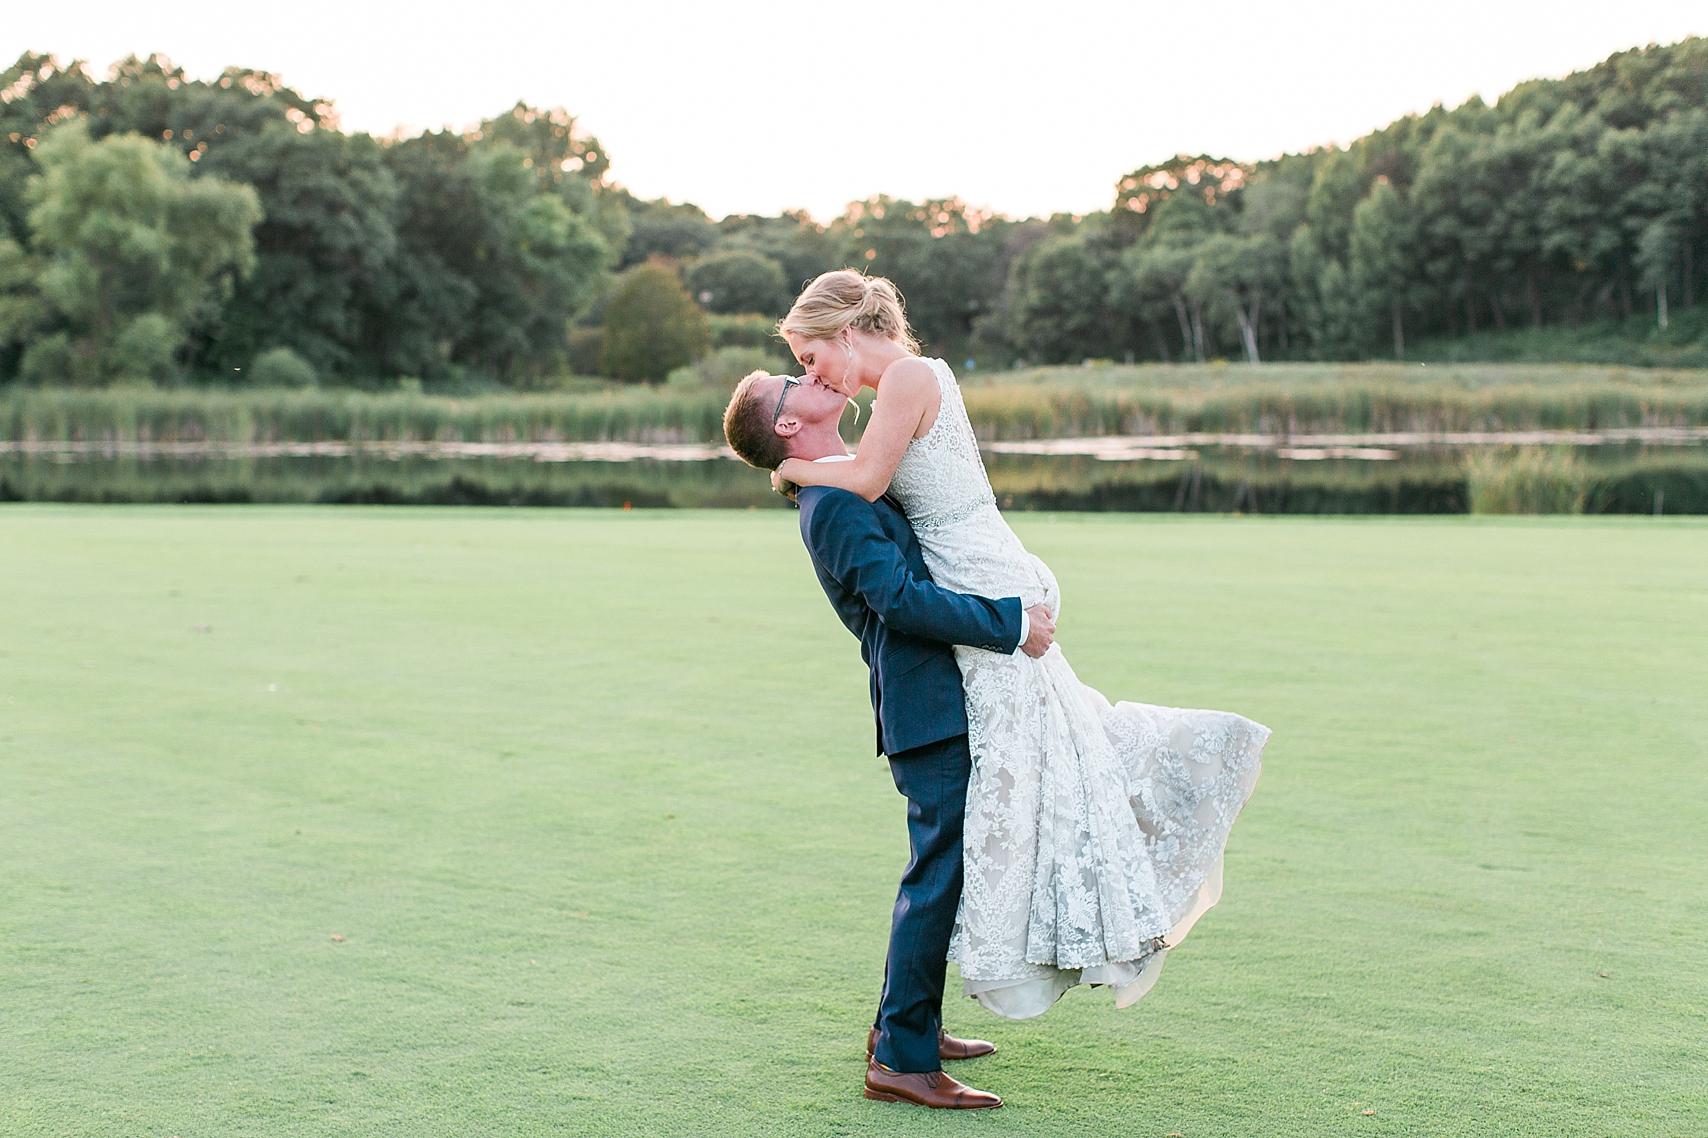 Minnesota Minneapolis Wedding Photographer Best Of 2018 Weddings Mallory Kiesow Photography_0118.jpg